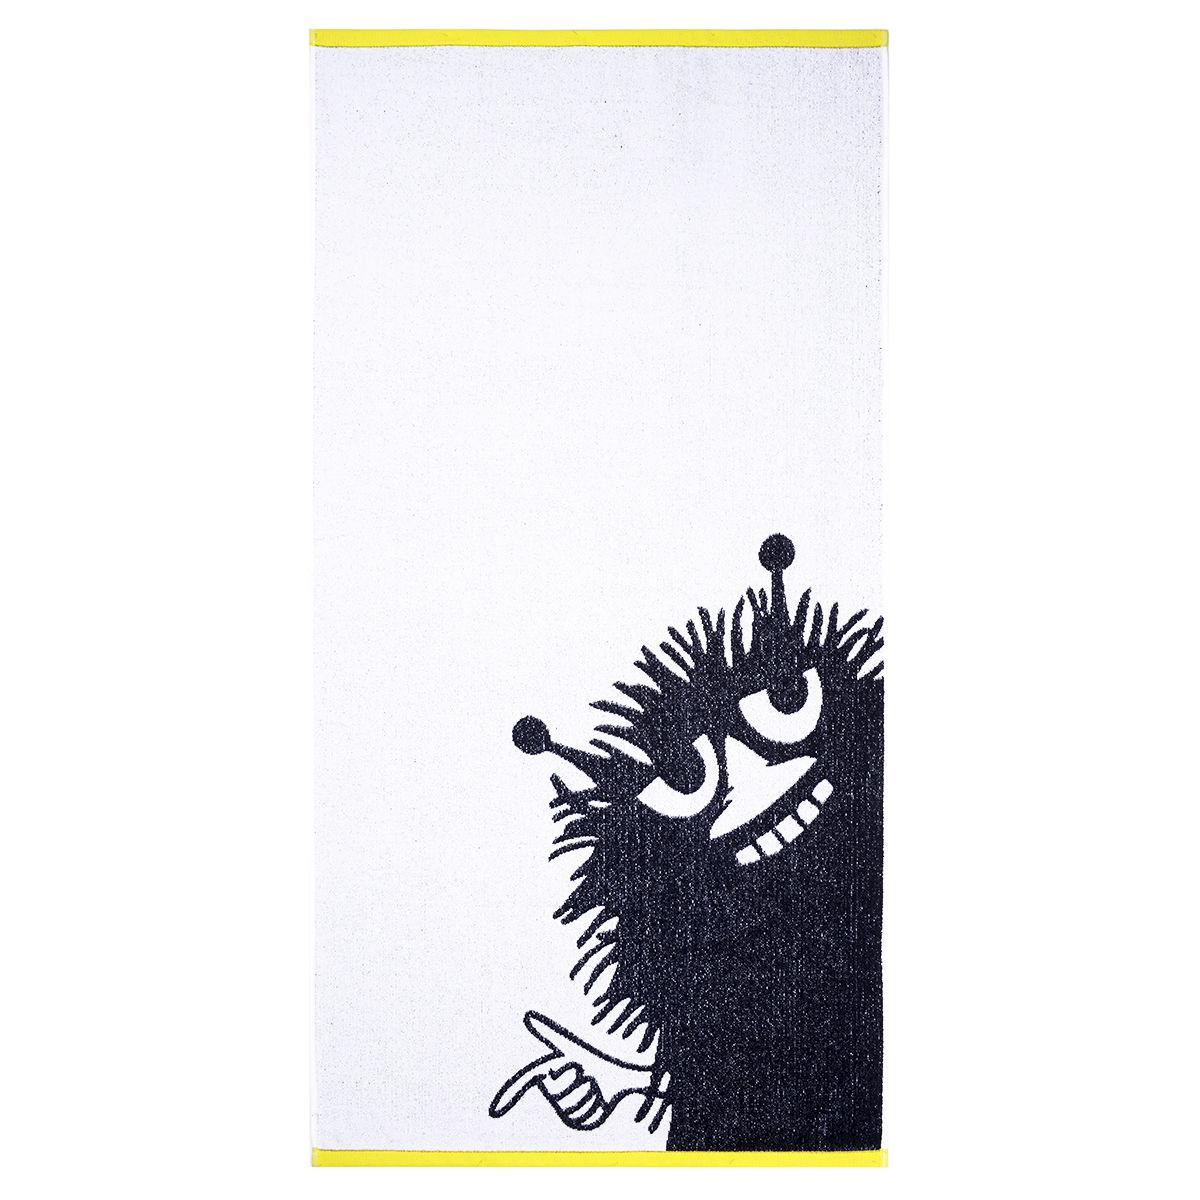 Stinky badlakan svart/vit/gul, Finlayson